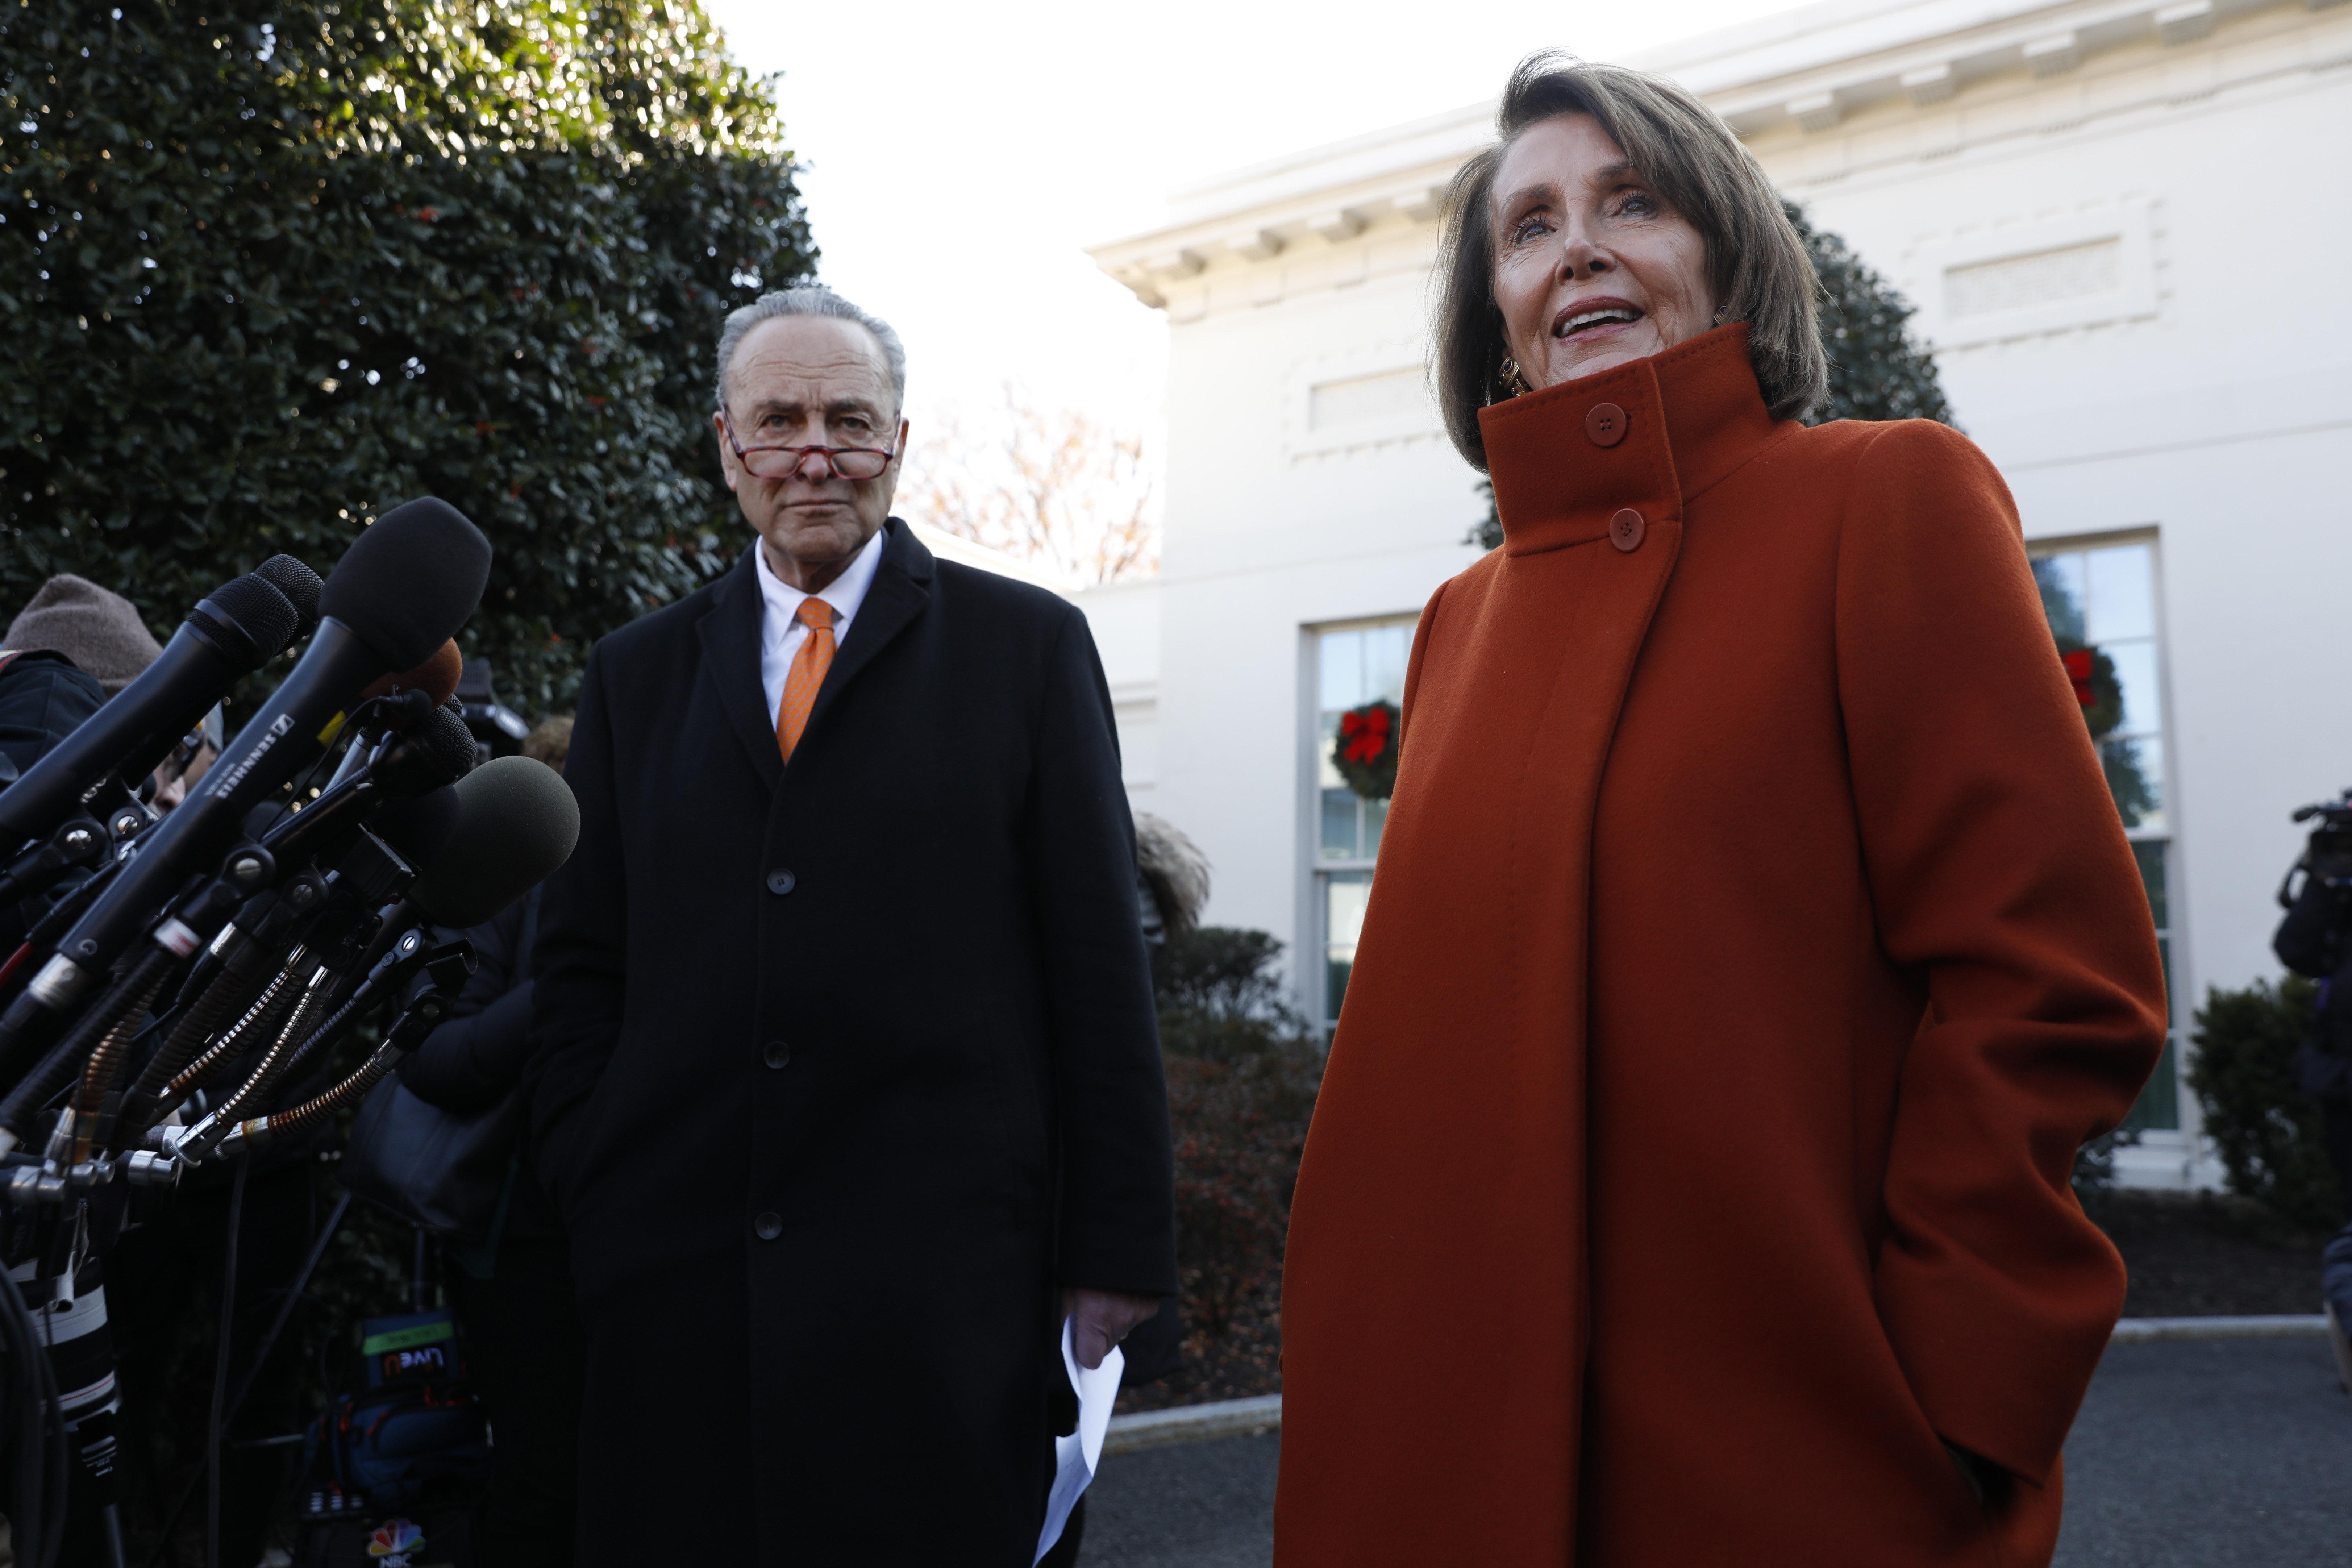 Nancy Pelosi in her now-iconic Max Mara Fire coat.